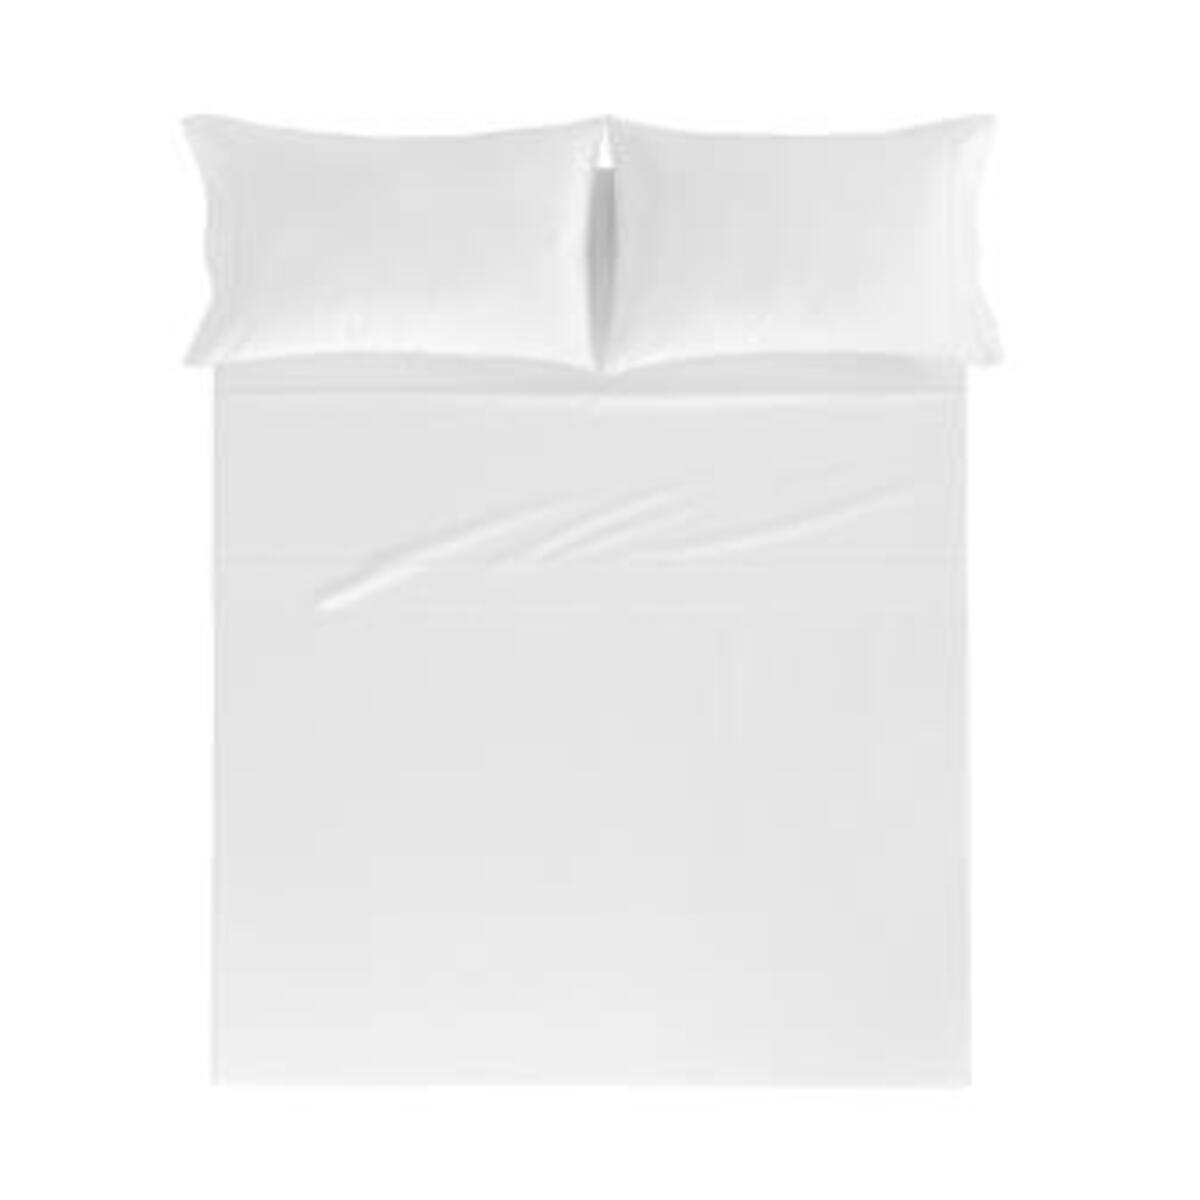 Drap de lit en coton percale blanc 160x280